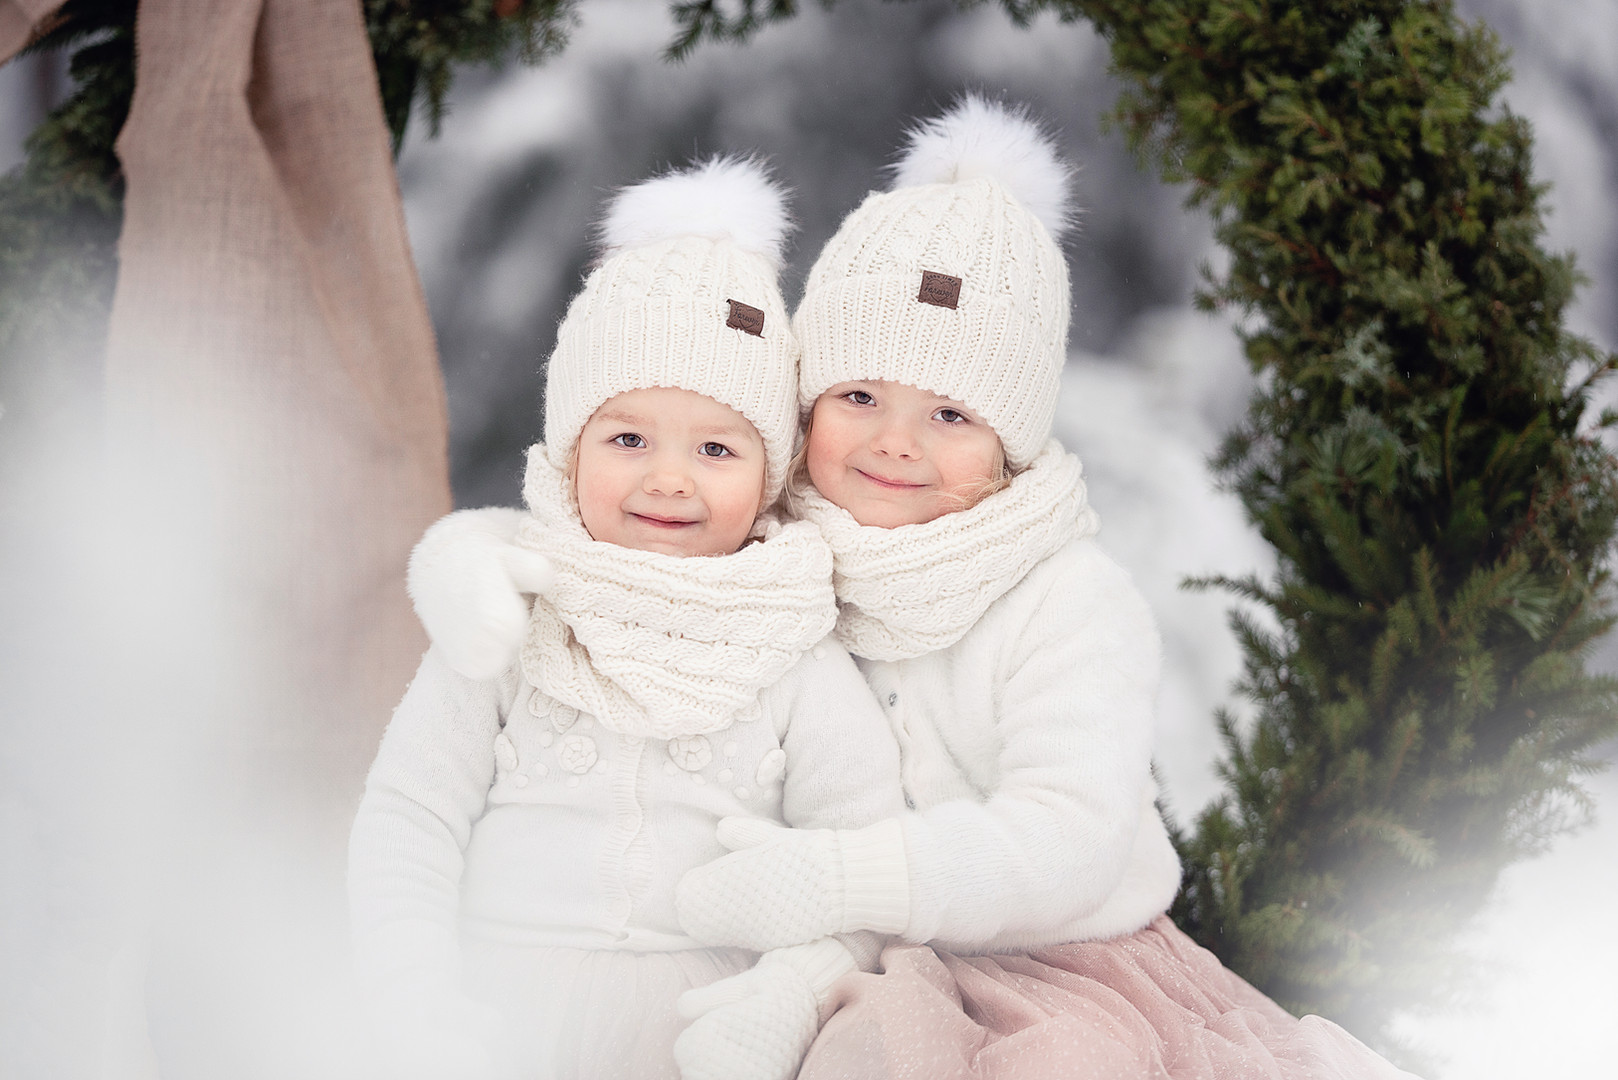 syskonfotografering i Umeå